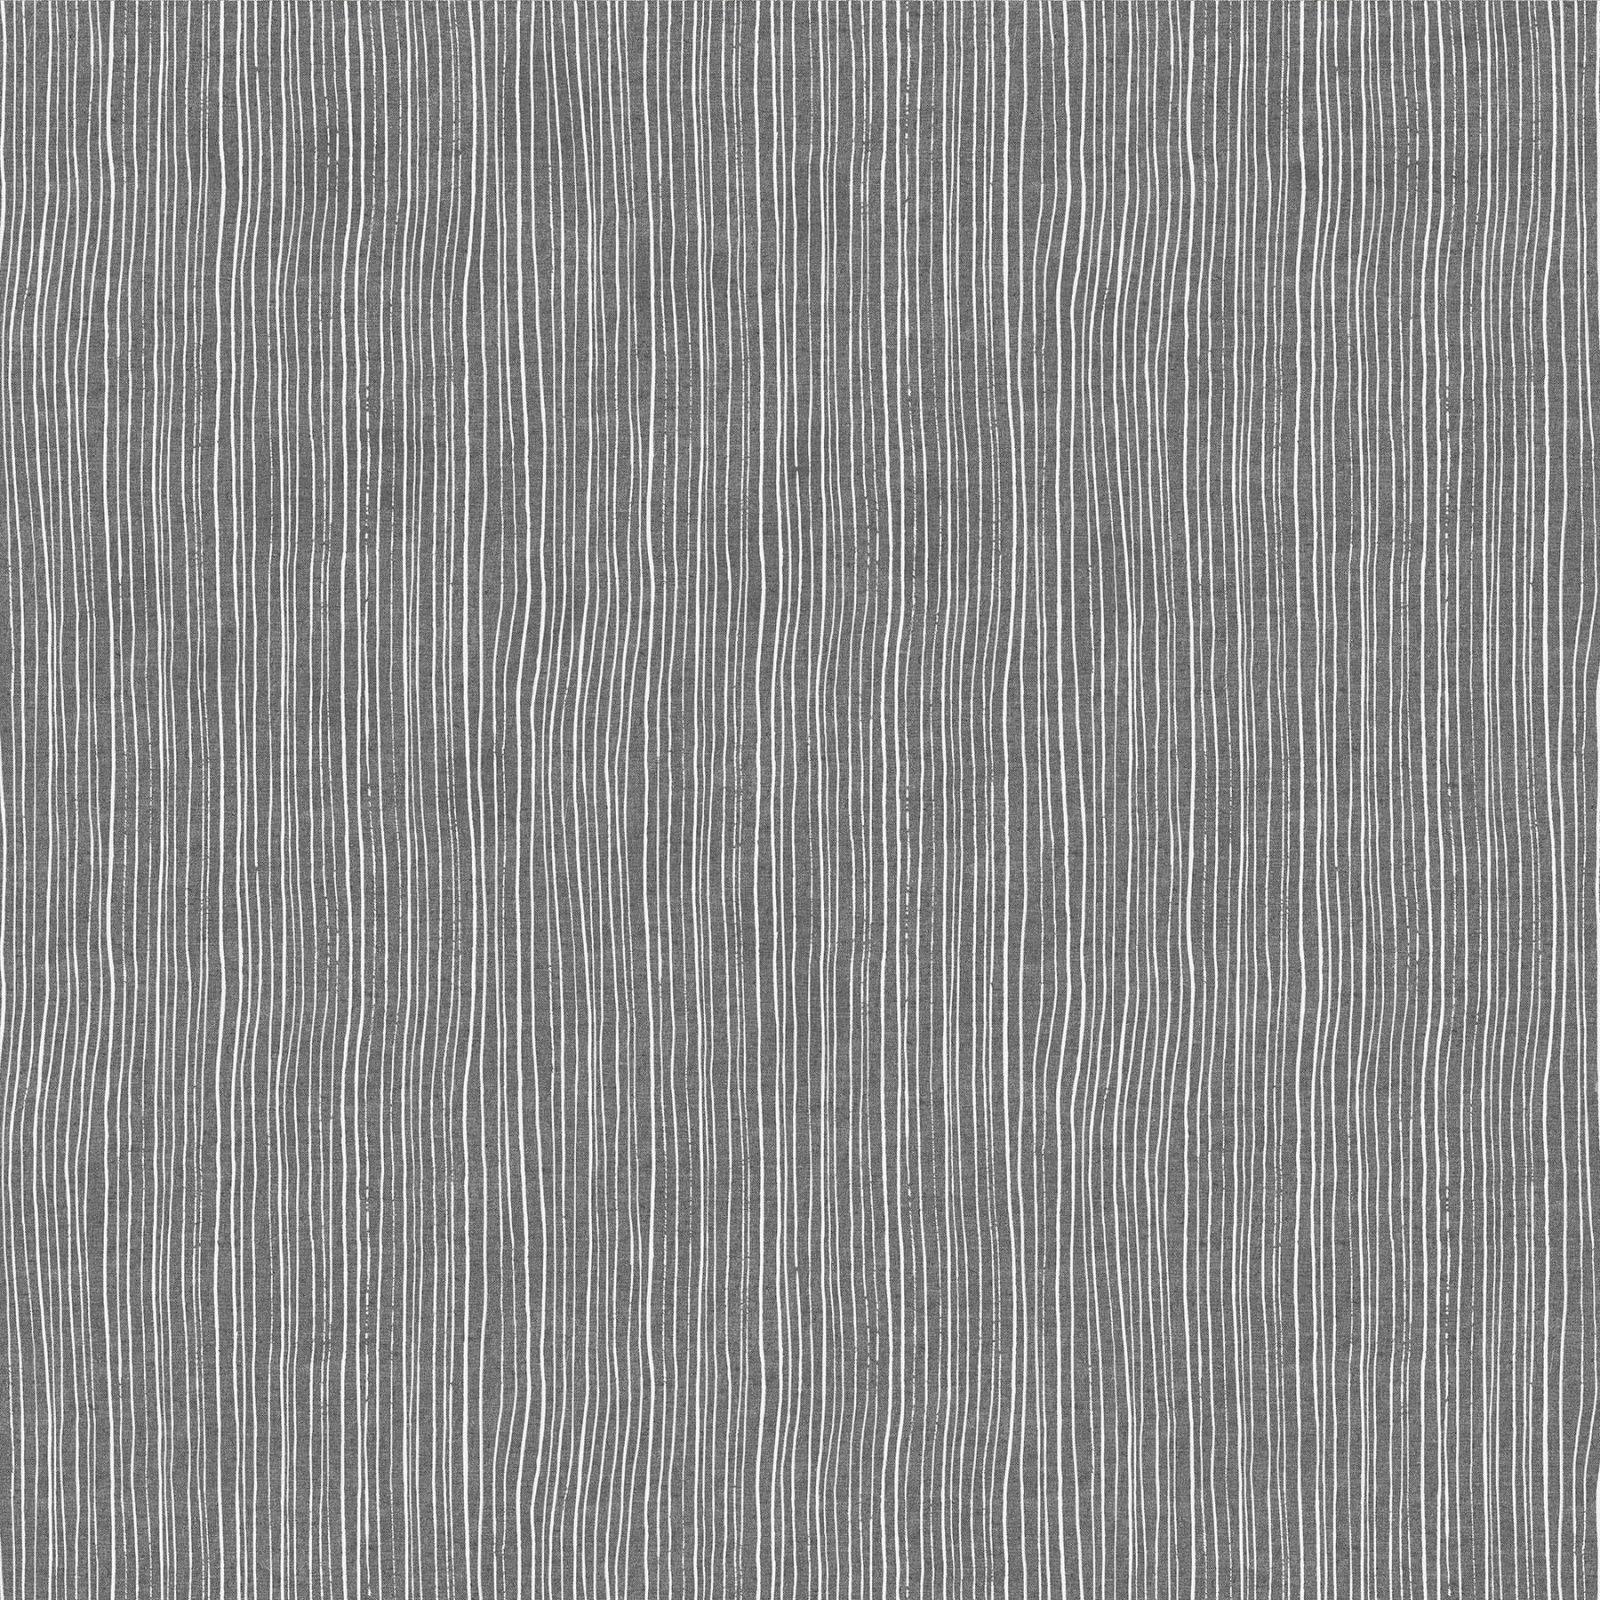 Harmony Strips Gray (55% linen/45% cotton)